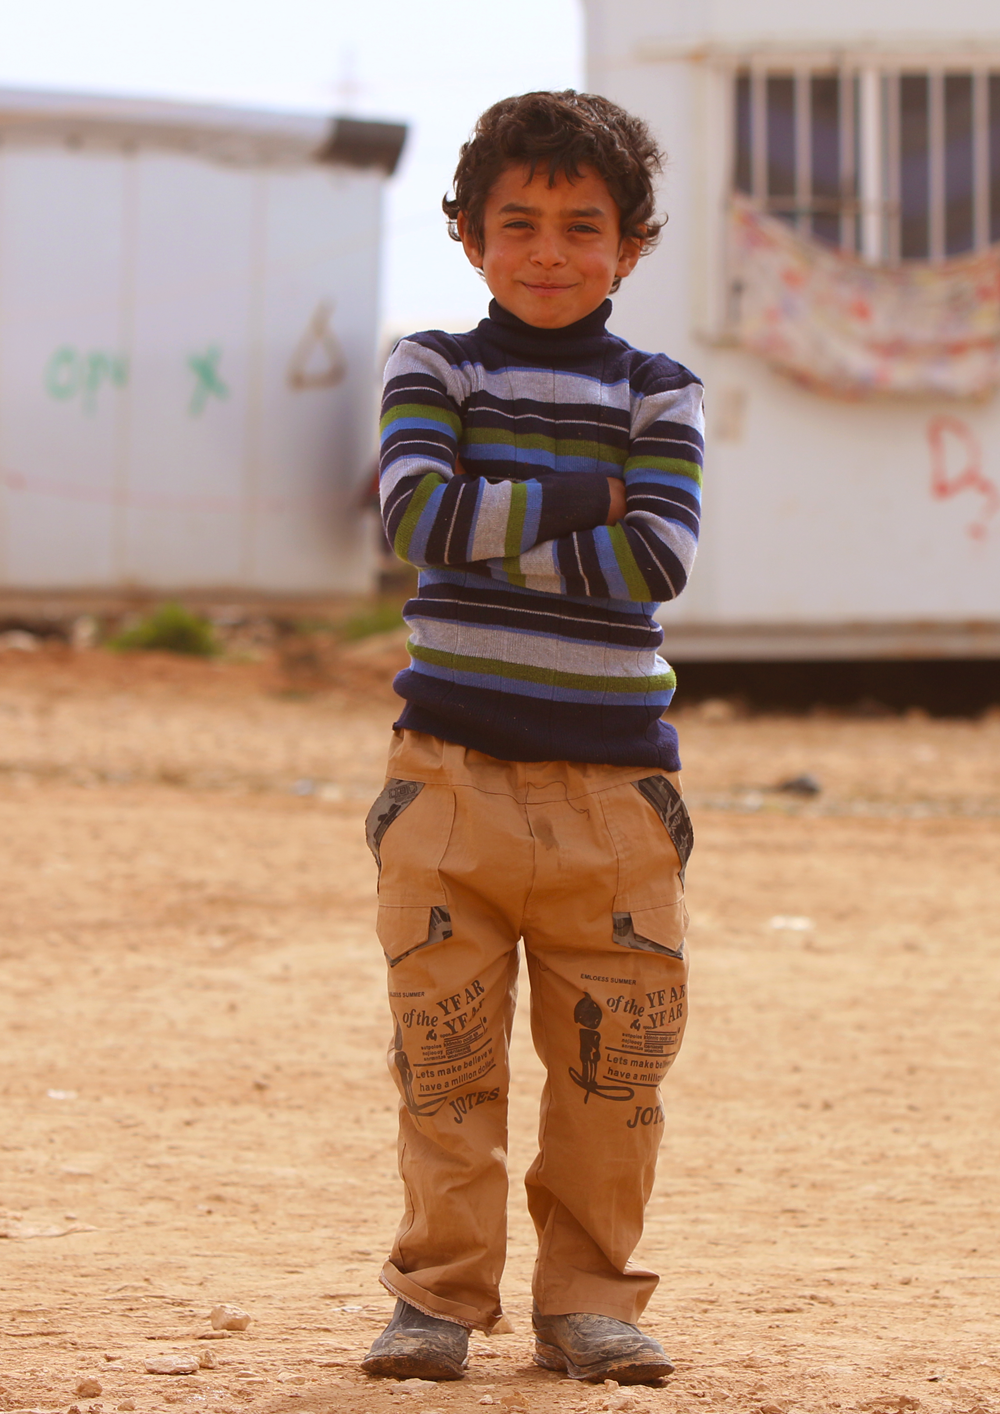 Syrian refugee boy crossing arms